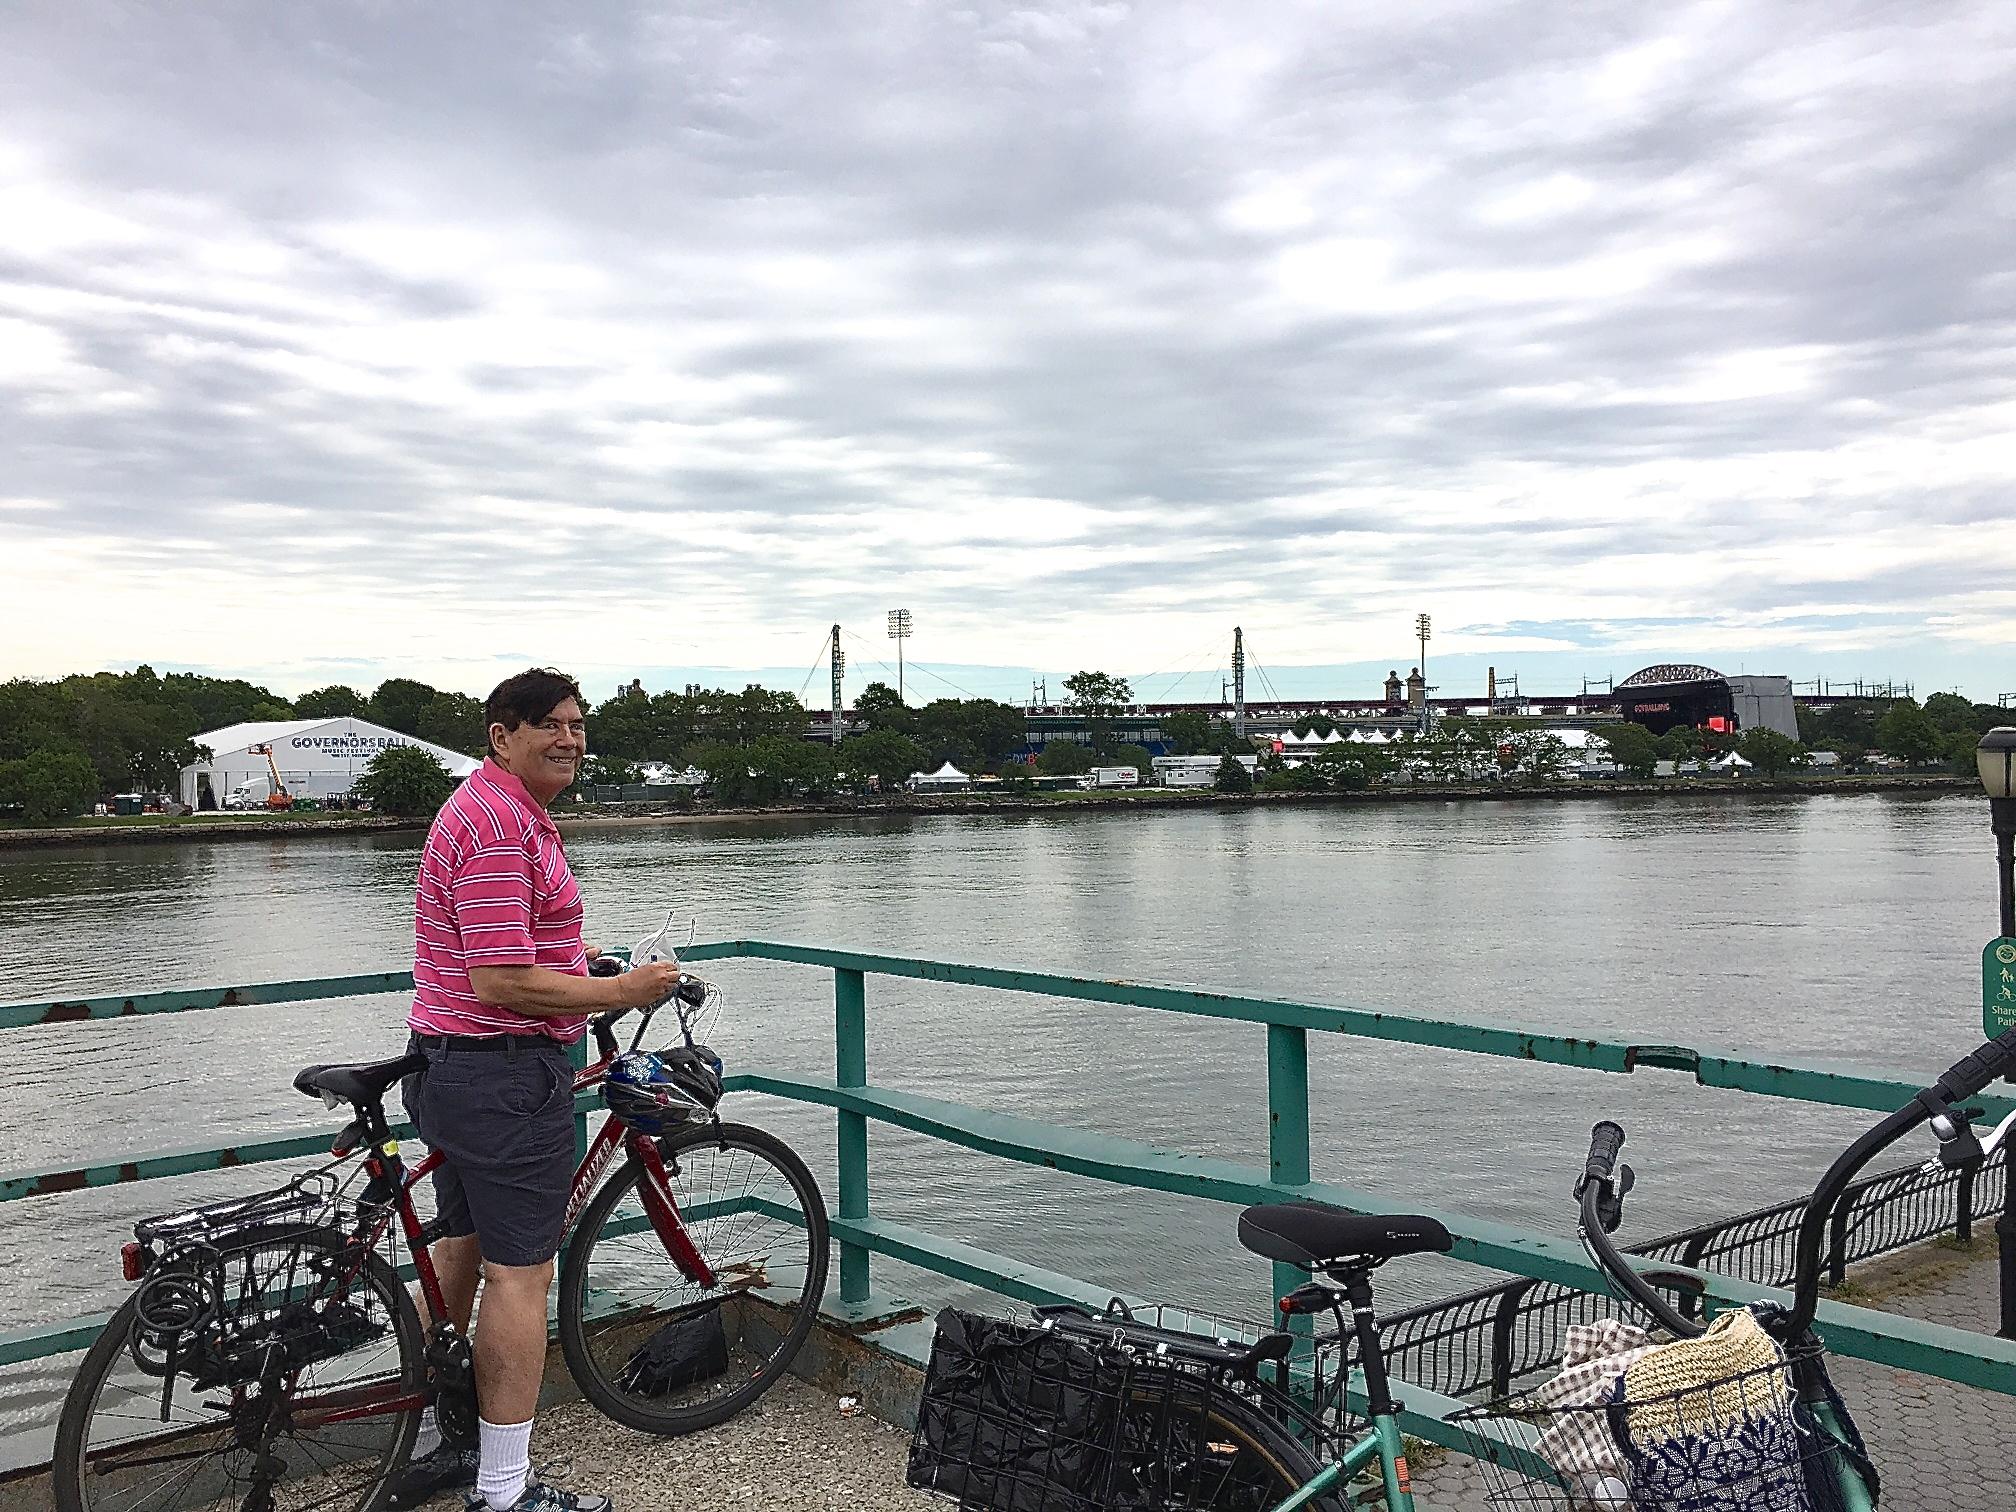 June 4, 2017  John overlooking the Governor's Ball concert scene on Randall's Island